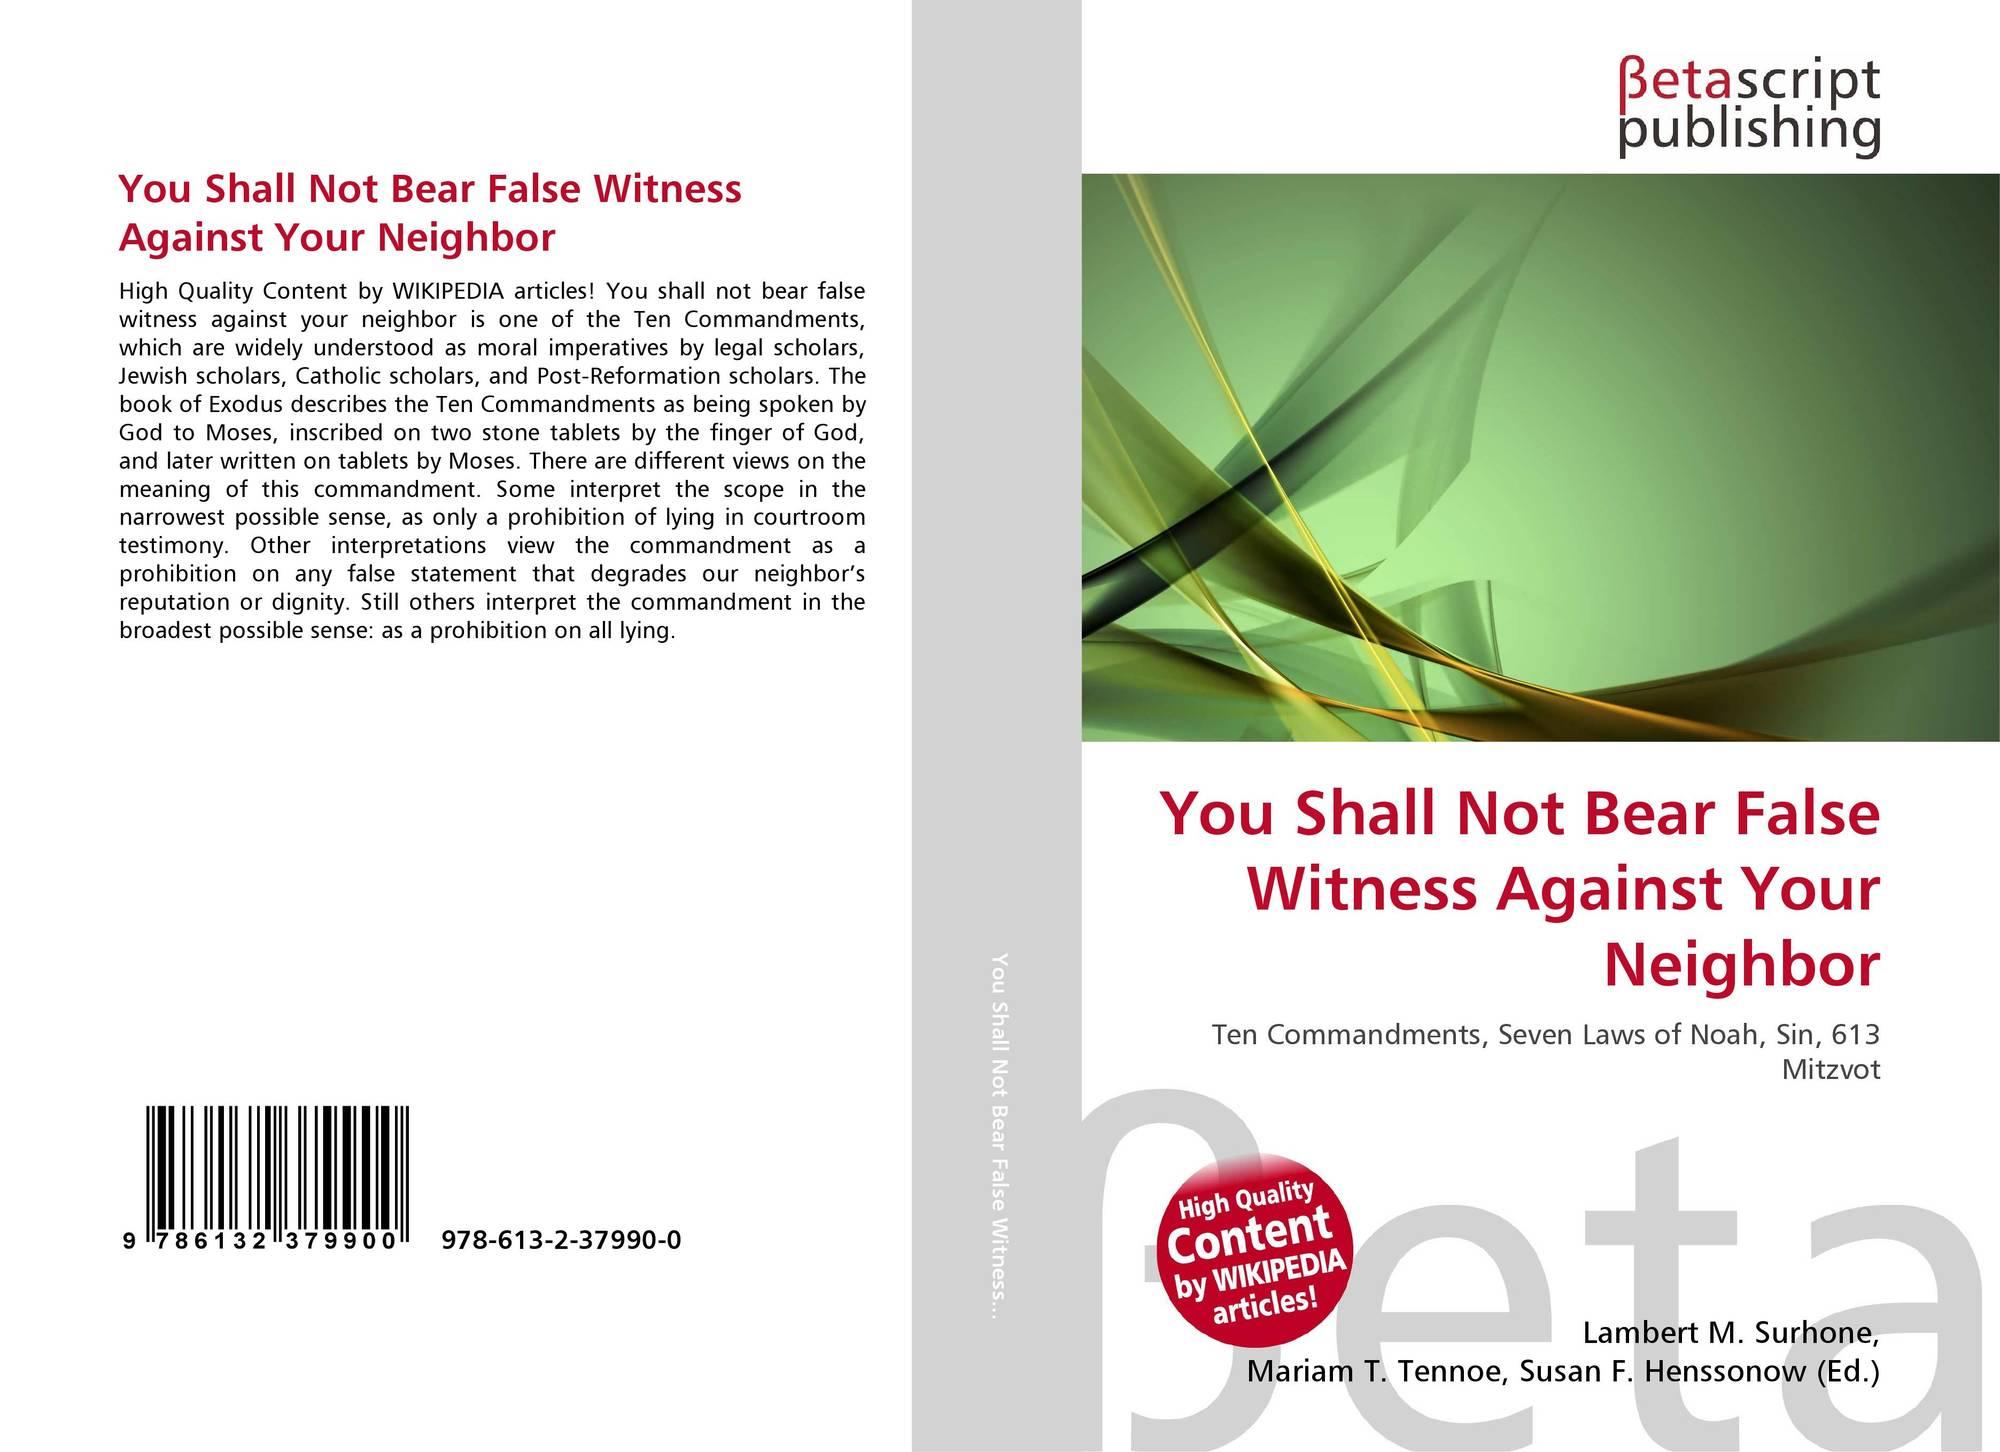 You Shall Not Bear False Witness Against Your Neighbor, 978